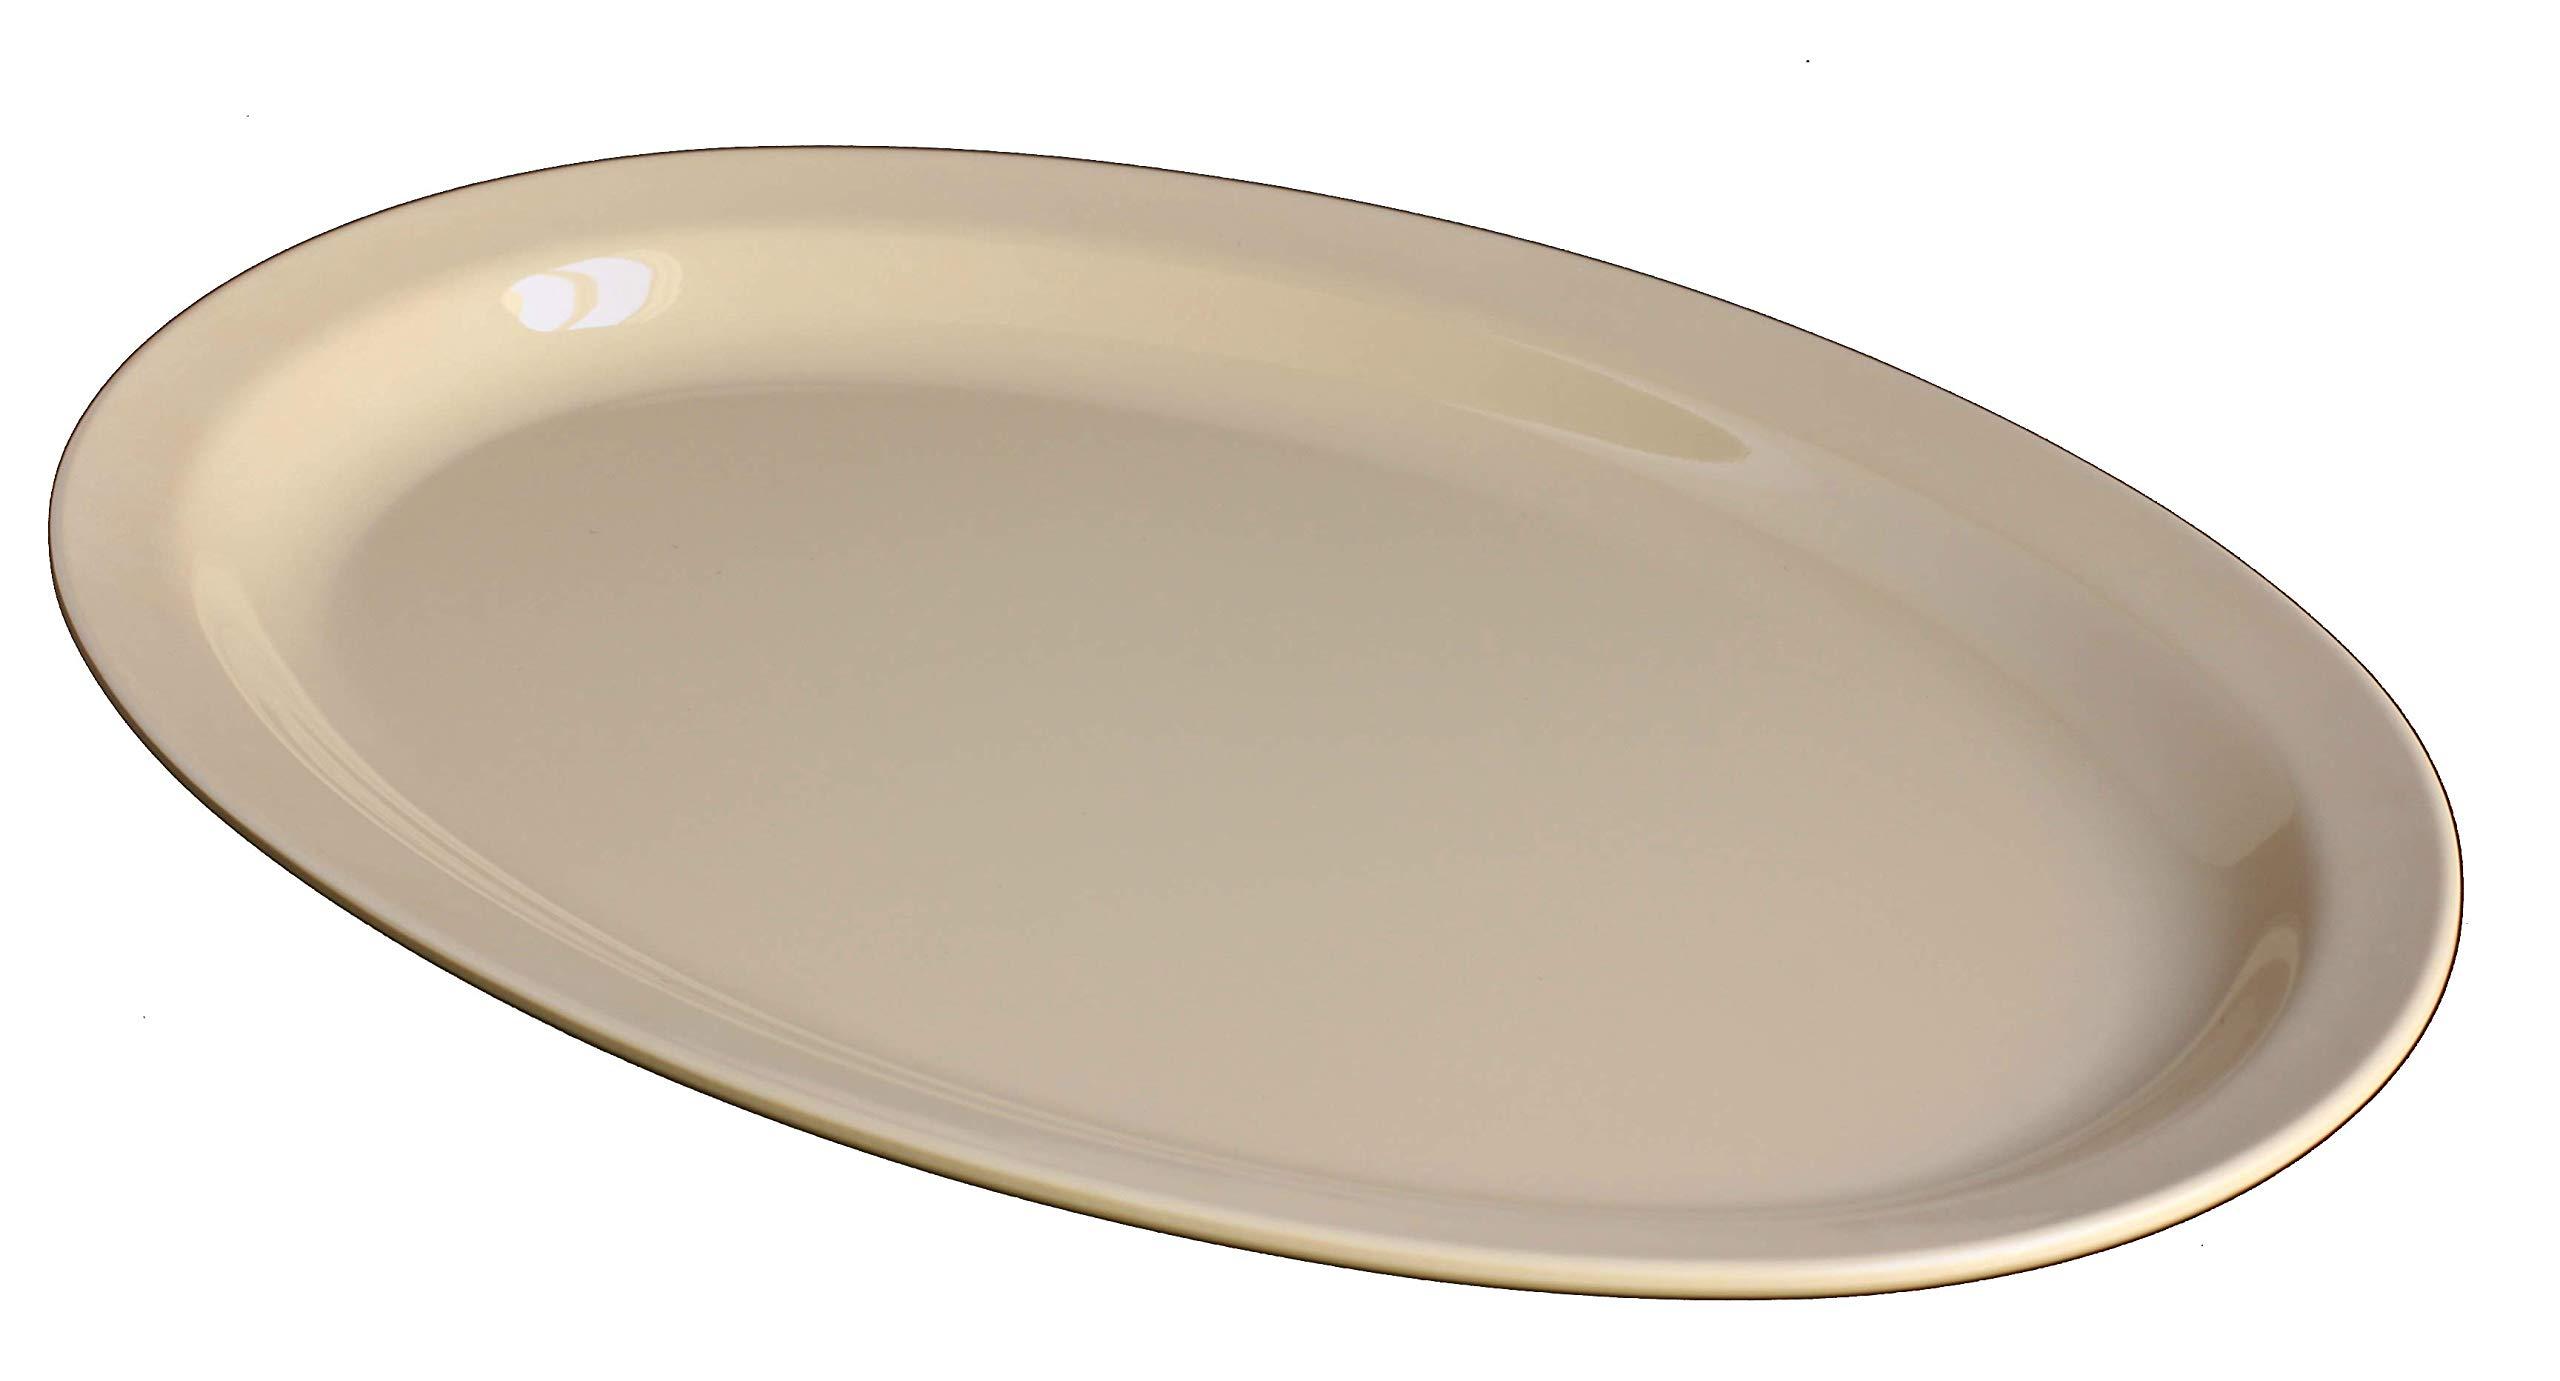 Z-Moments Western Melamine 513 Oval Plate Narrow Rim Platter 13'' X 8-1/2'', 48-pcs per case (4 dozen) NSF (Tan)